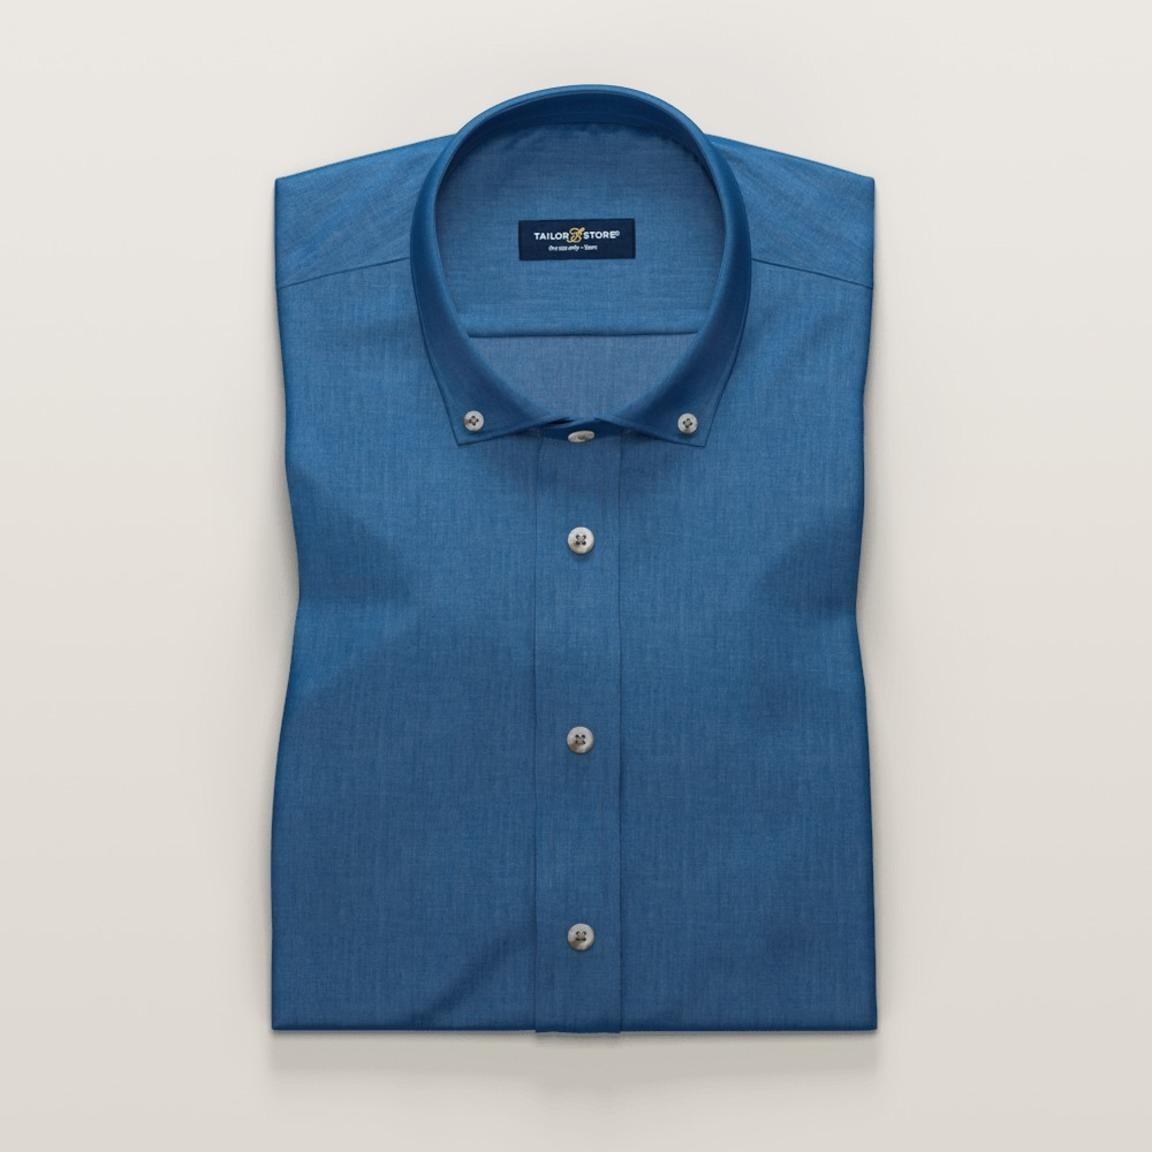 Denim blue short sleeved shirt in cotton-Tencel twill fabric